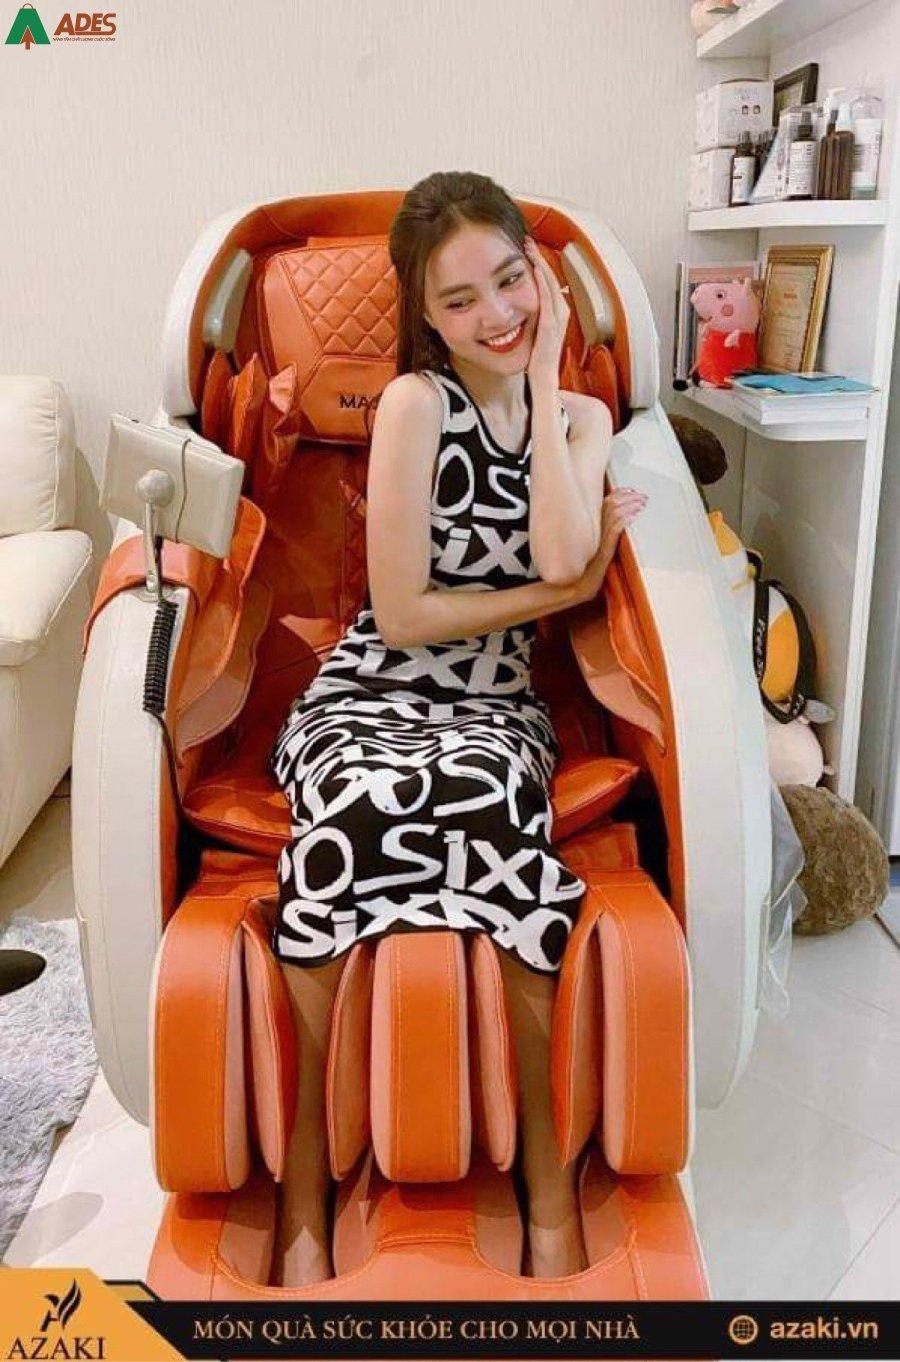 Ghe Massage Azaki Maxxspeed ES30 thuc te